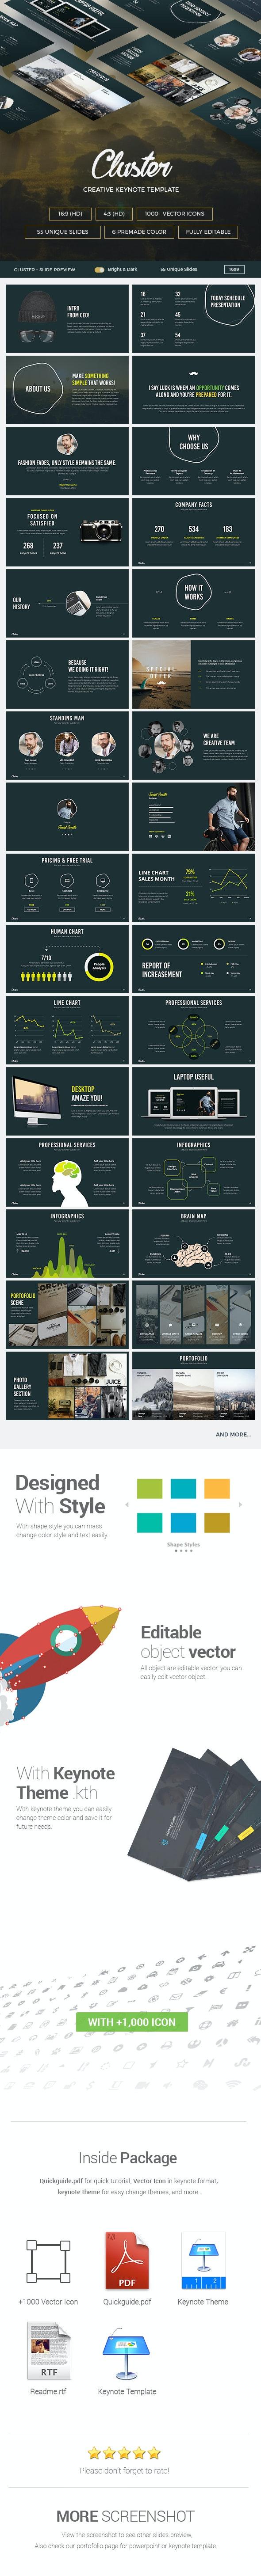 Cluster - Creative Keynote Template - Creative Keynote Templates